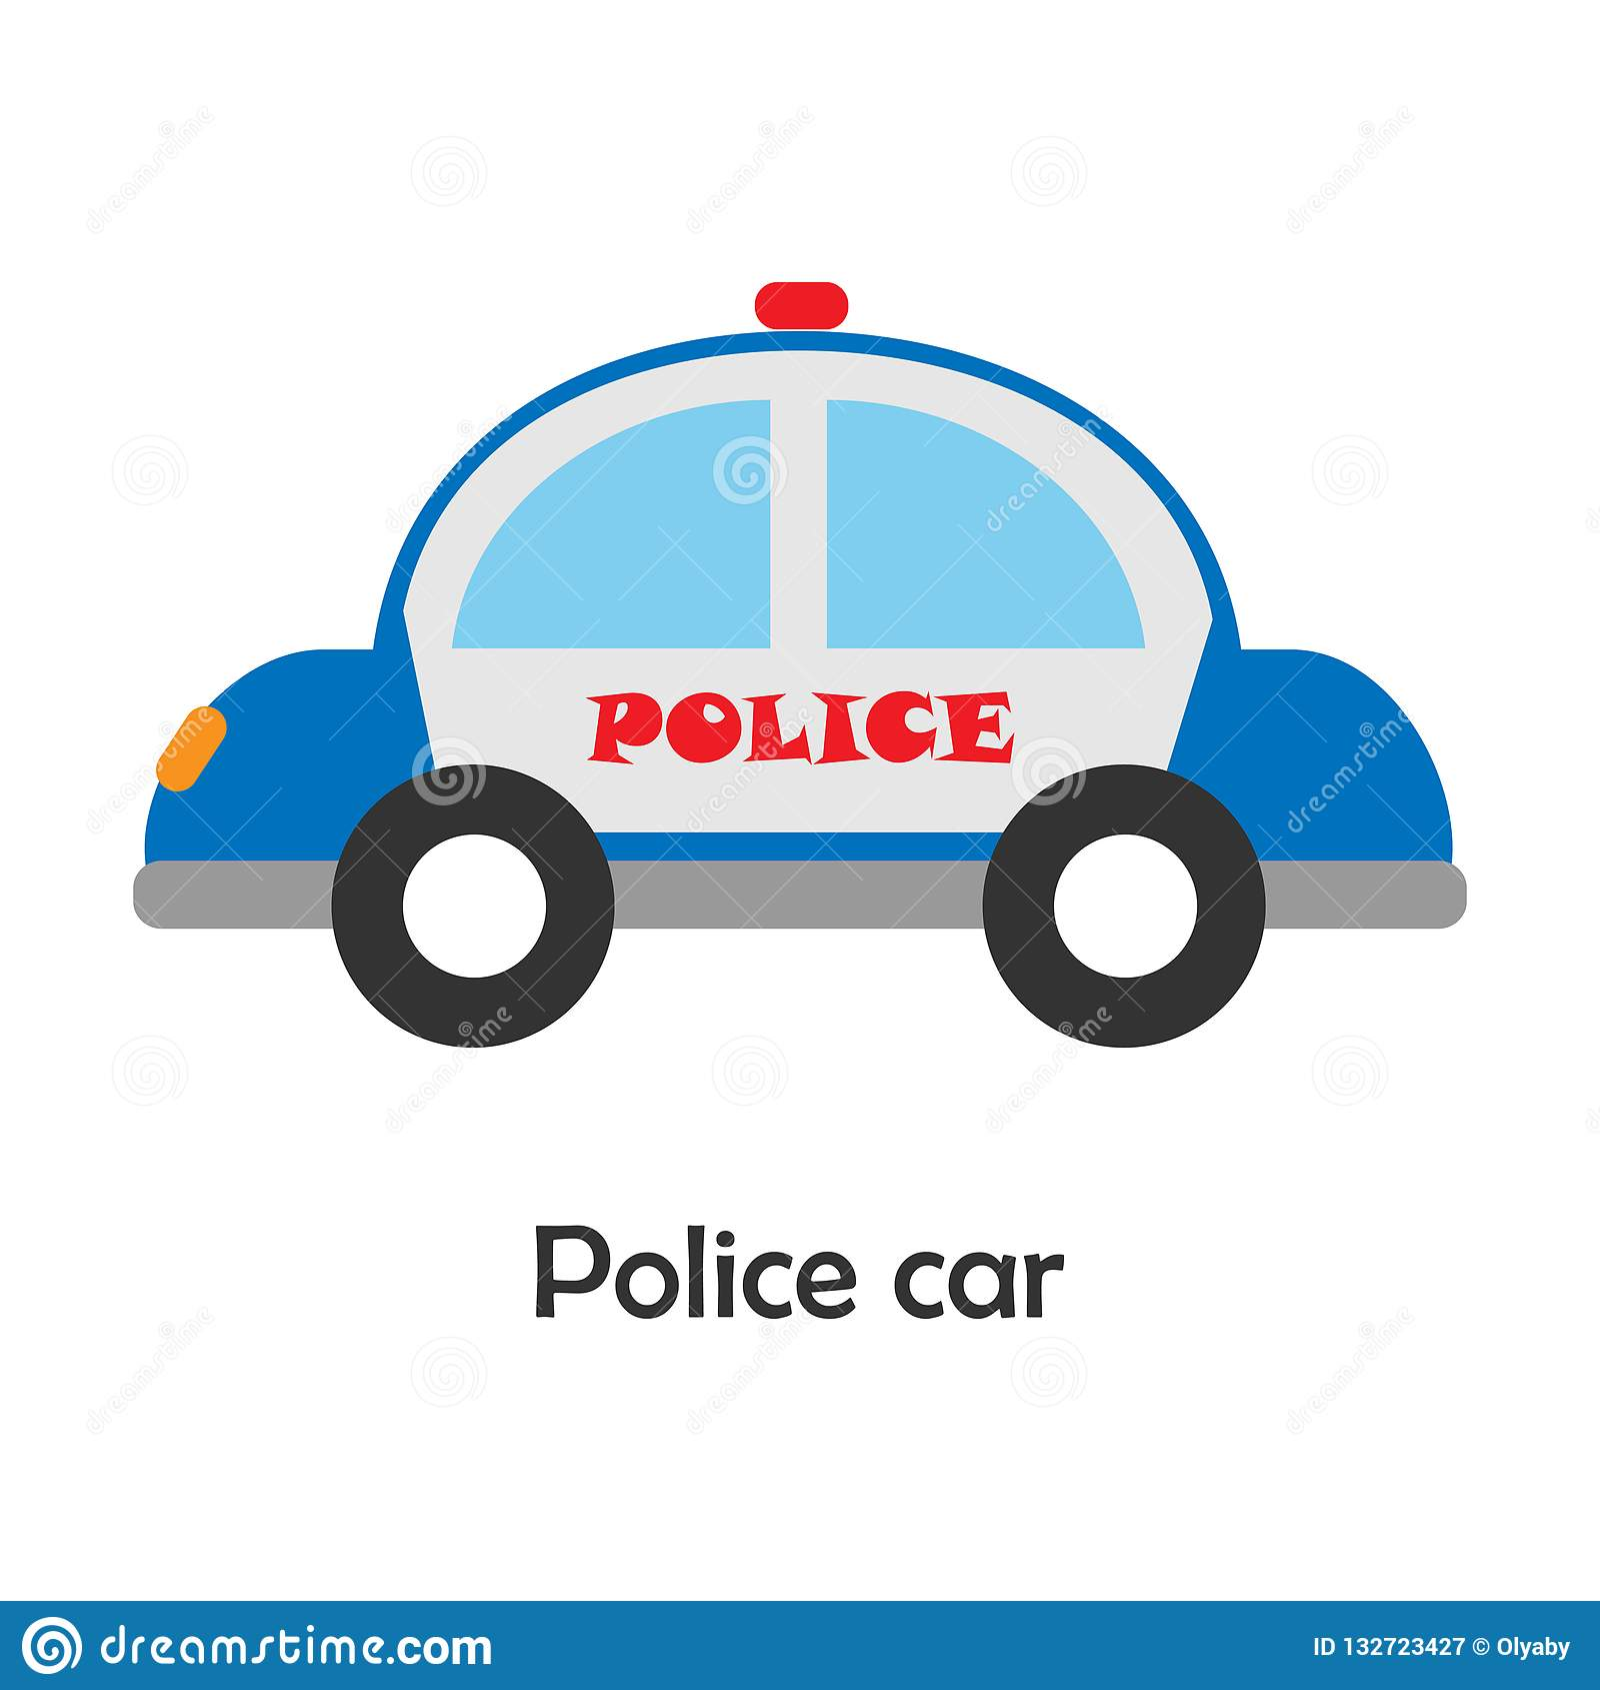 Police Concept Detailed Illustration Of Swat Officer